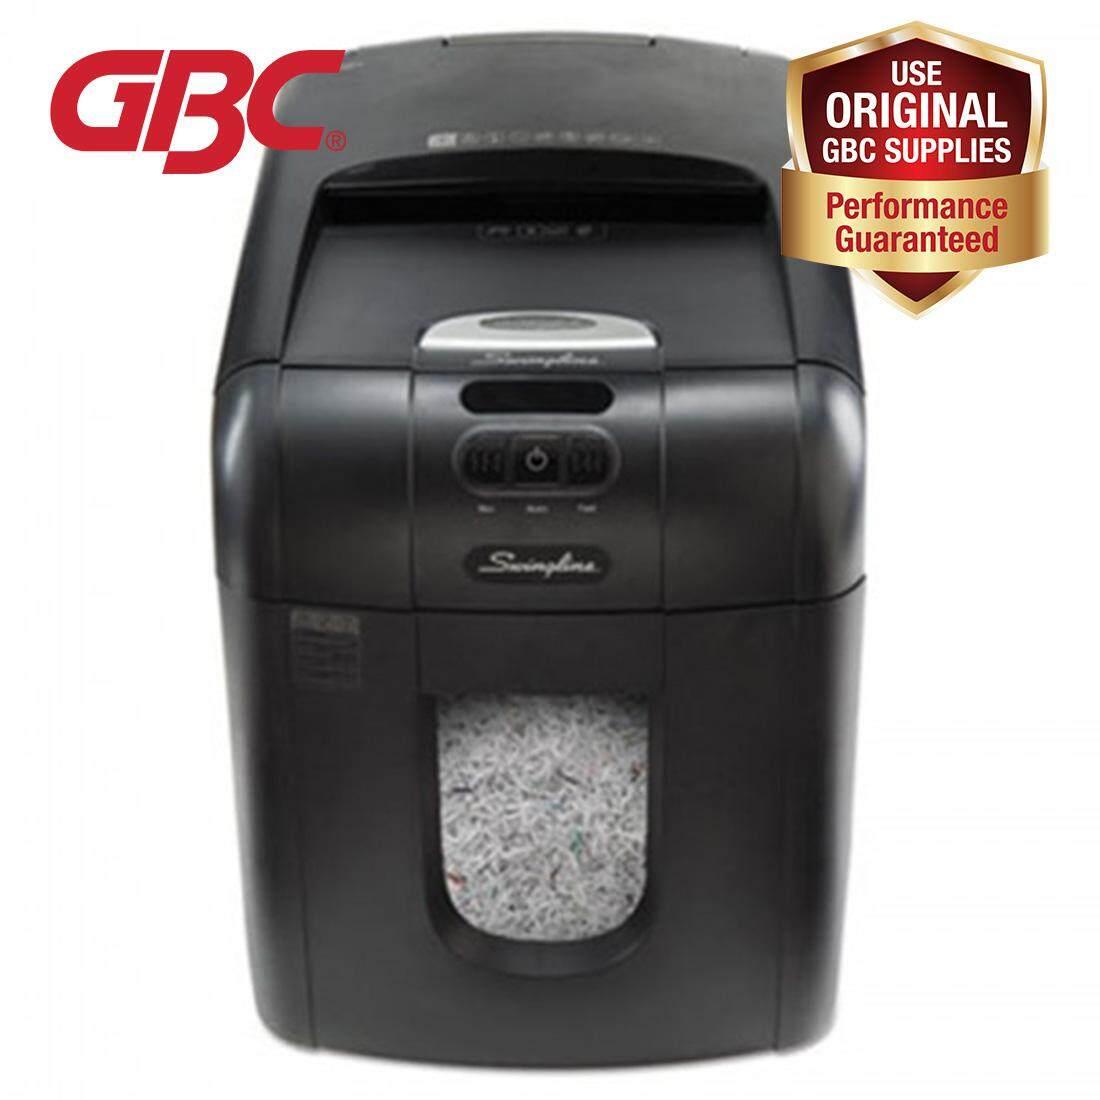 GBC Auto+ 130M Executive Shredder